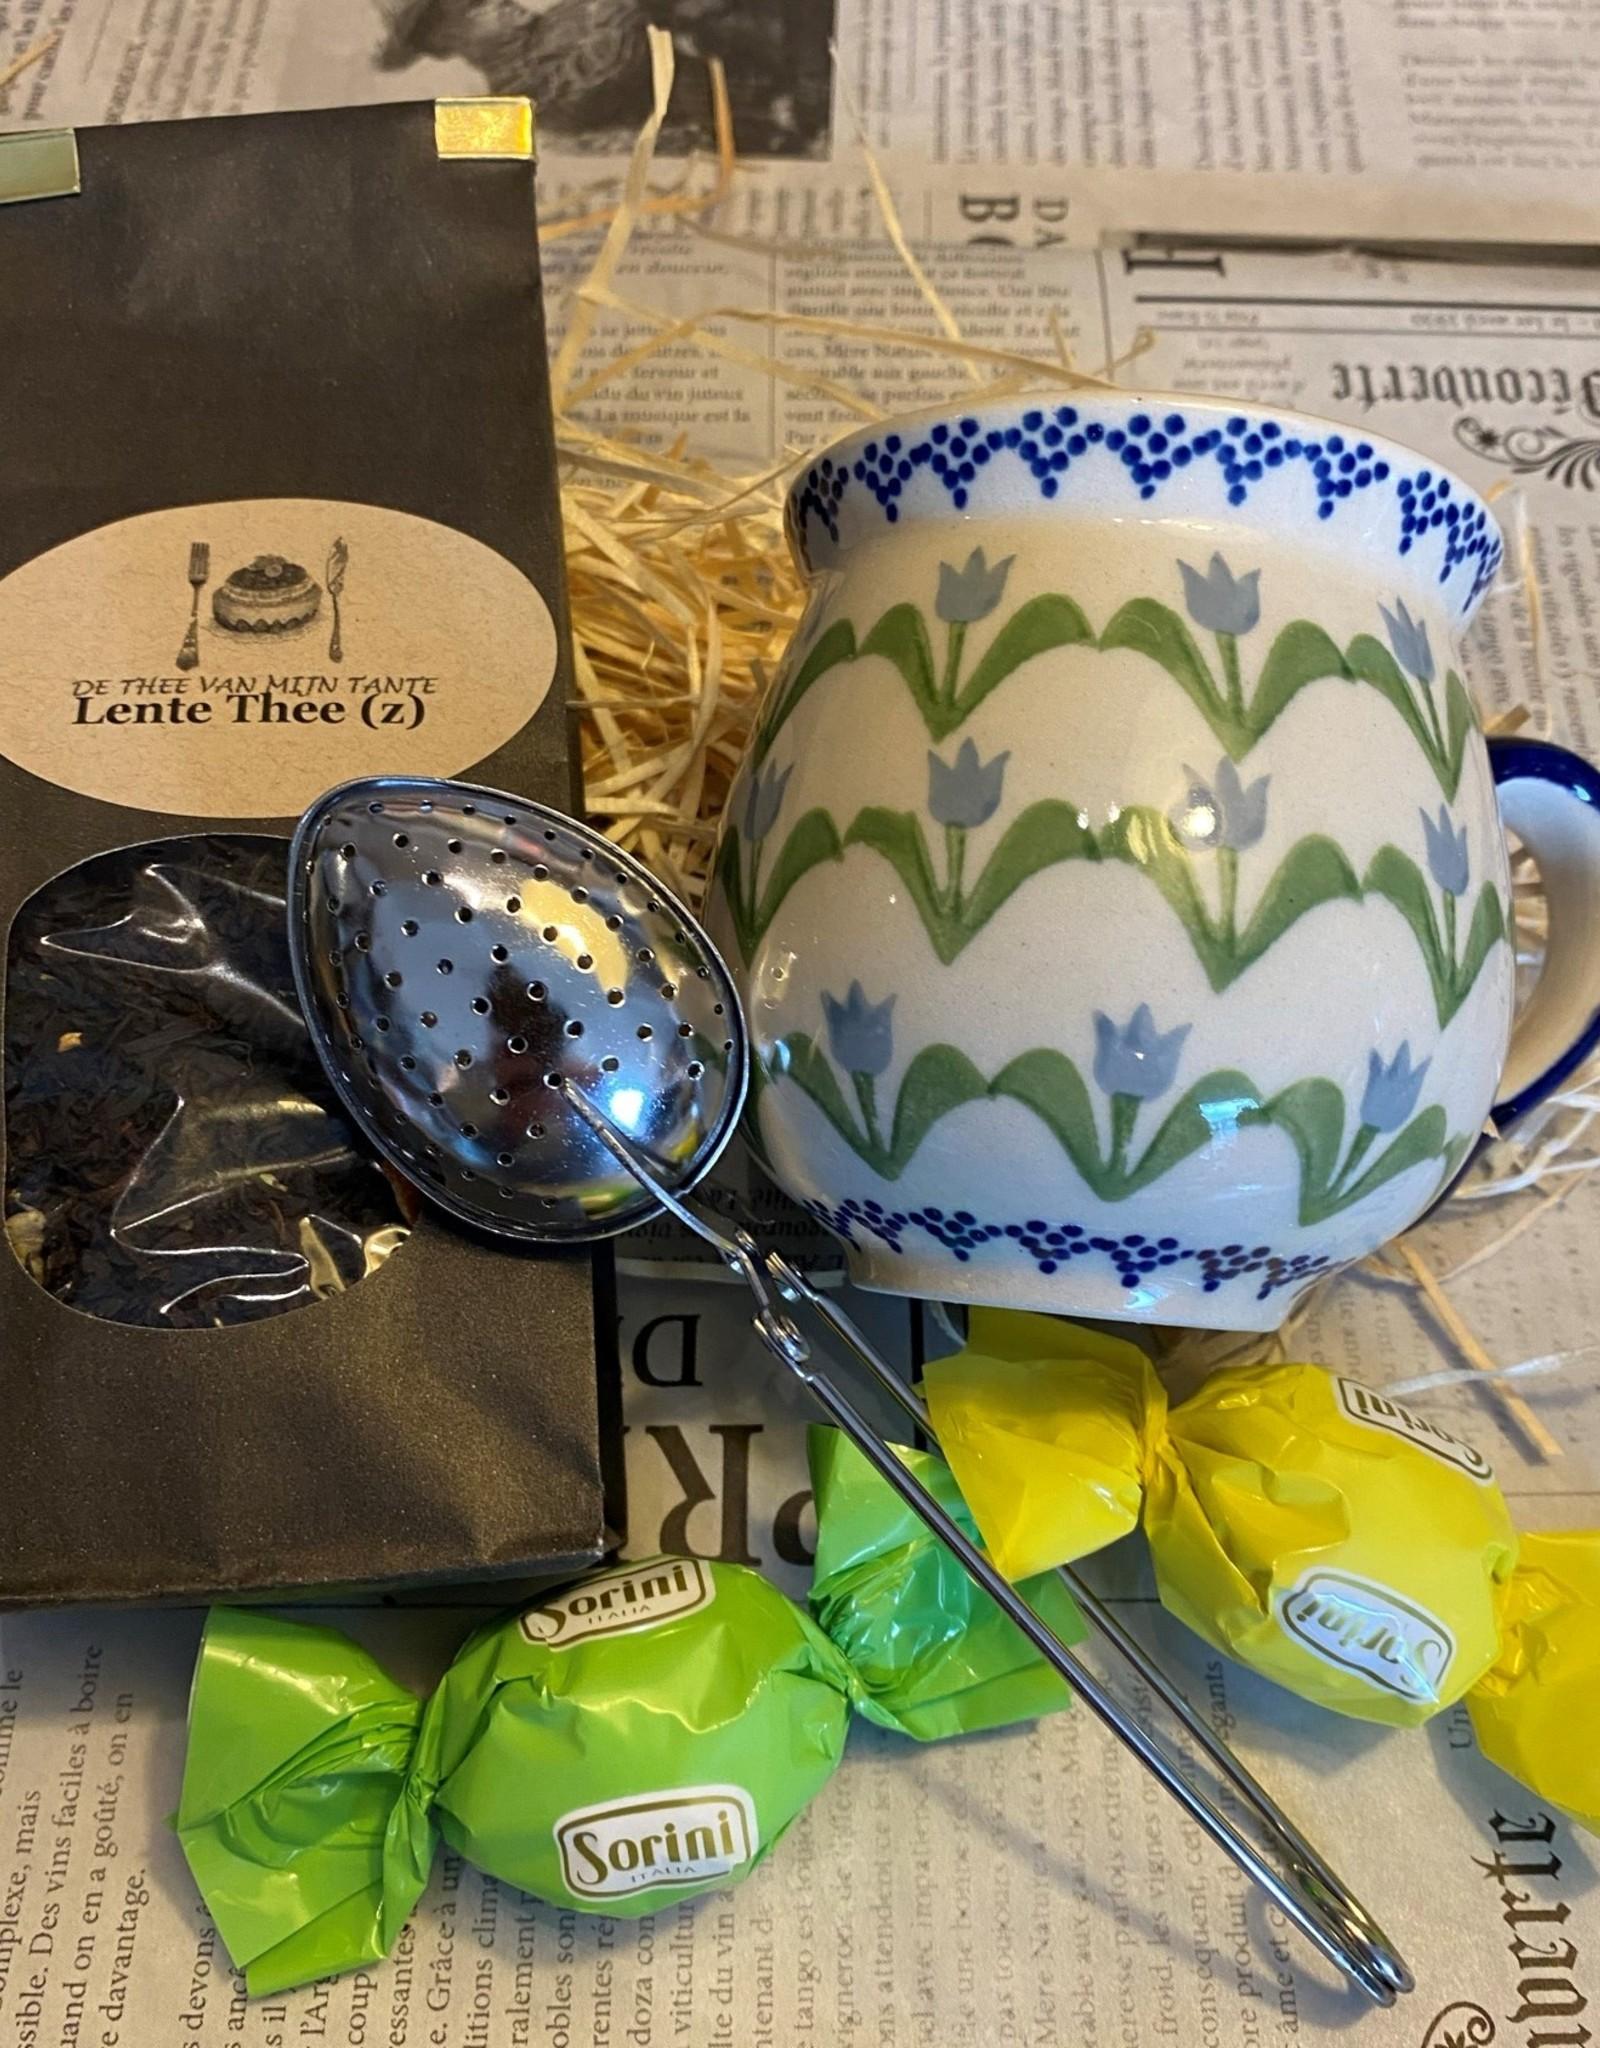 Lentepakketje met Bunzlaumok blauwe tulpen